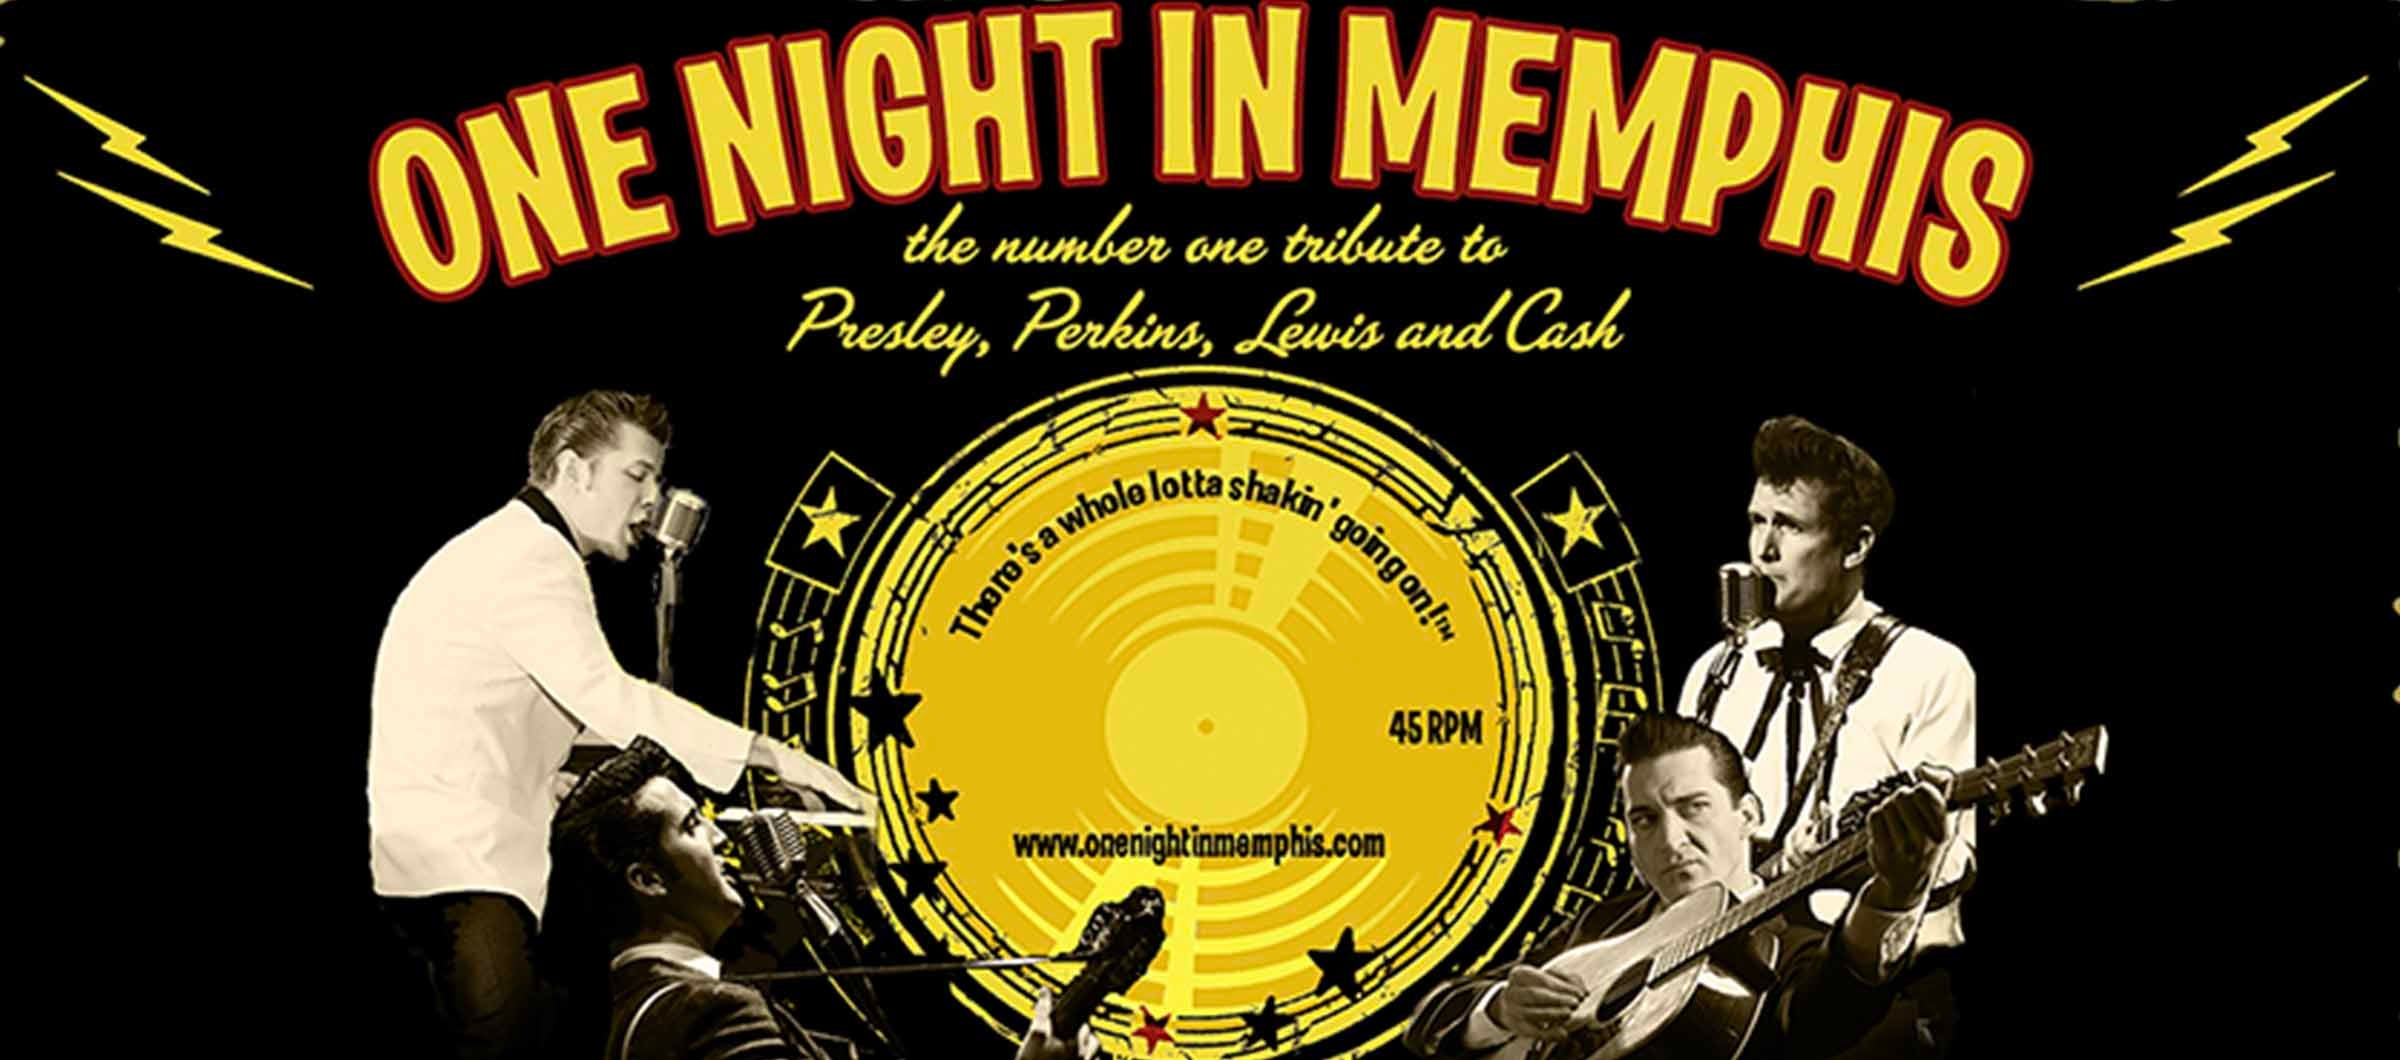 One Night In Memphis